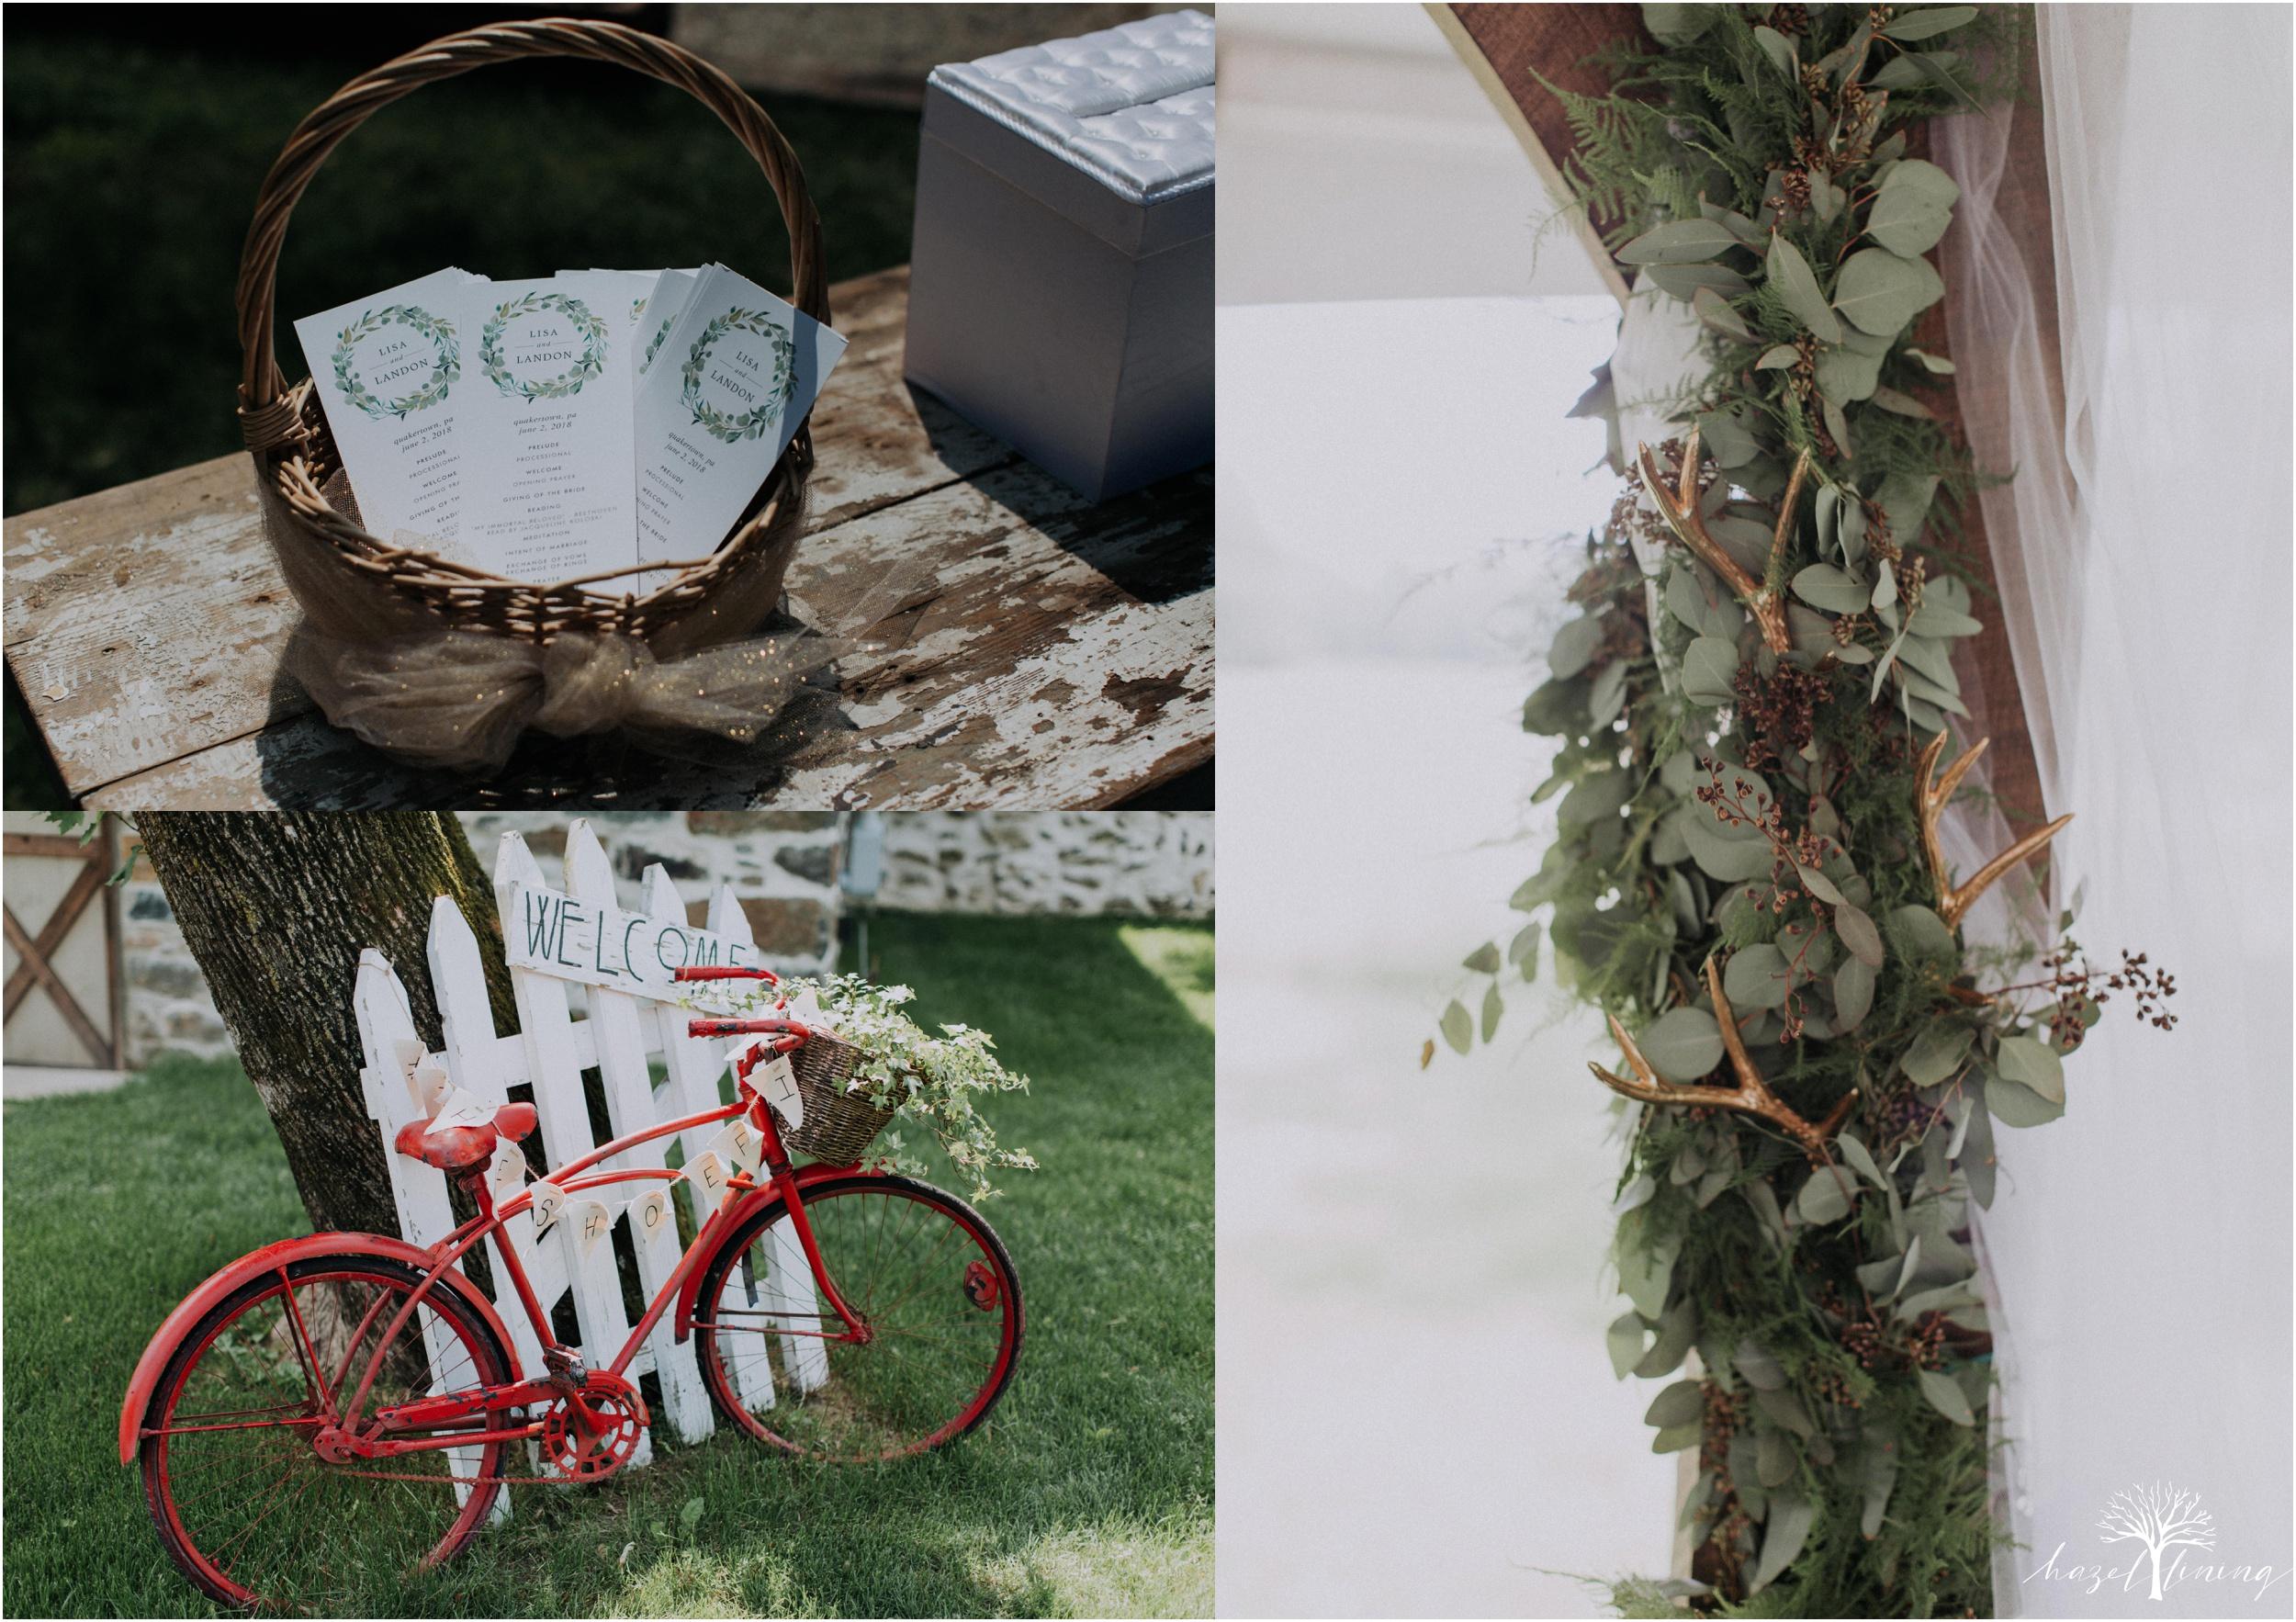 hazel-lining-travel-wedding-elopement-photography-lisa-landon-shoemaker-the-farm-bakery-and-events-bucks-county-quakertown-pennsylvania-summer-country-outdoor-farm-wedding_0050.jpg